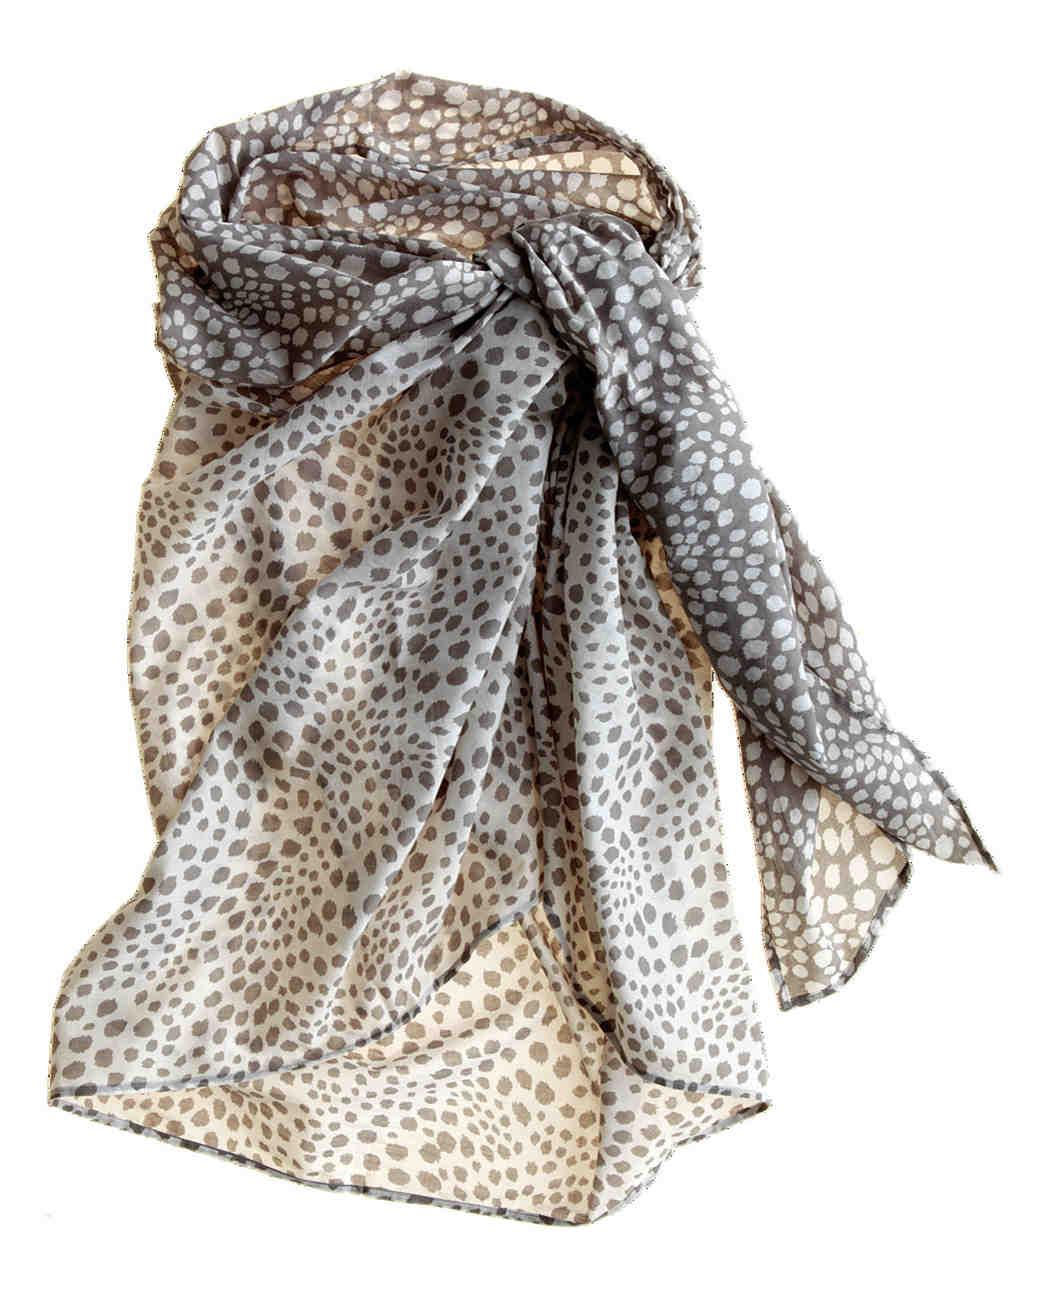 travel-accessories-sarong-mwd107604.jpg